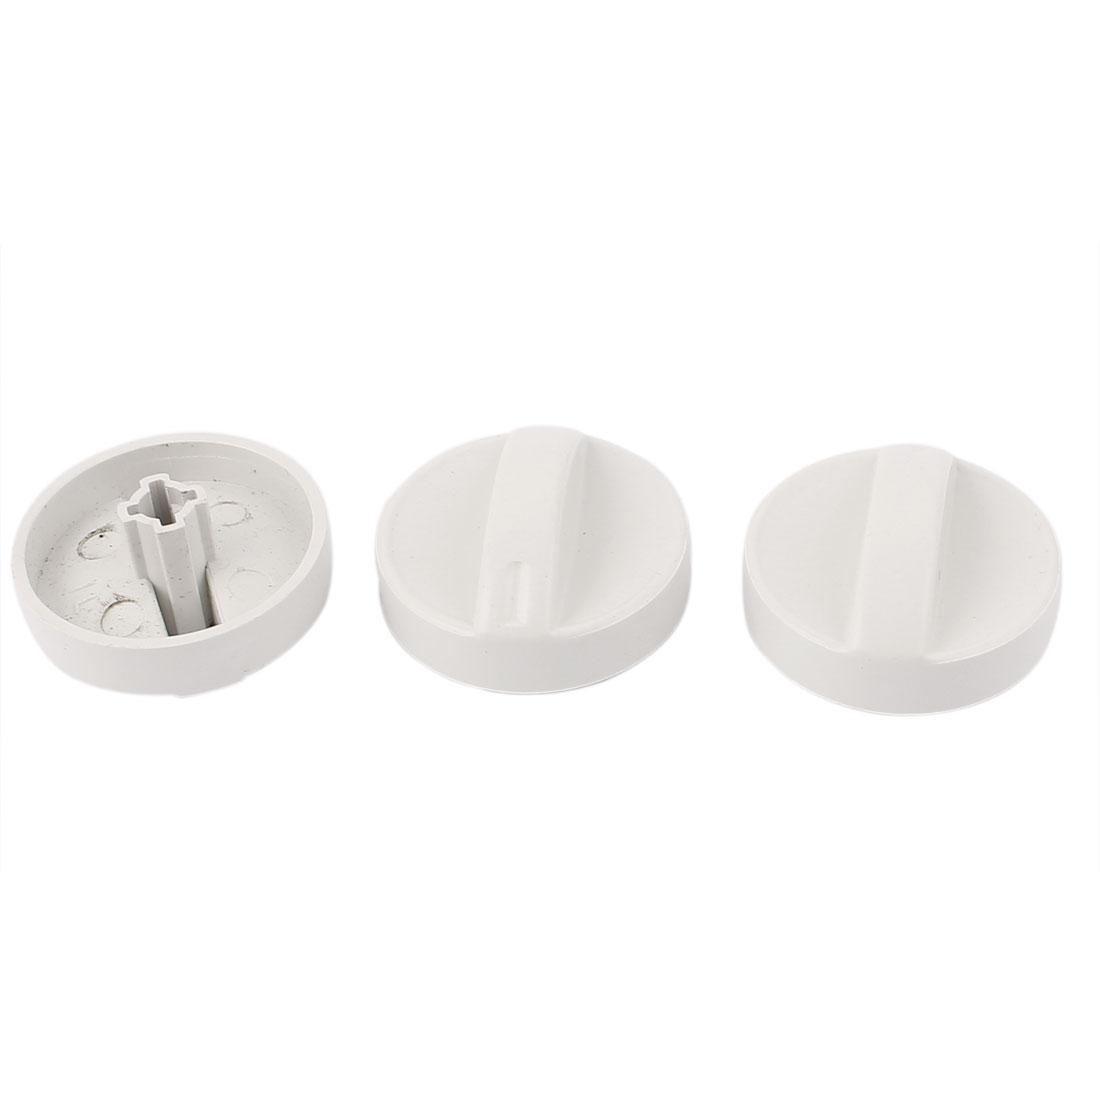 Washing Machine Cross Slot 6mm Inner Dia Turning Timer Knob White 3pcs